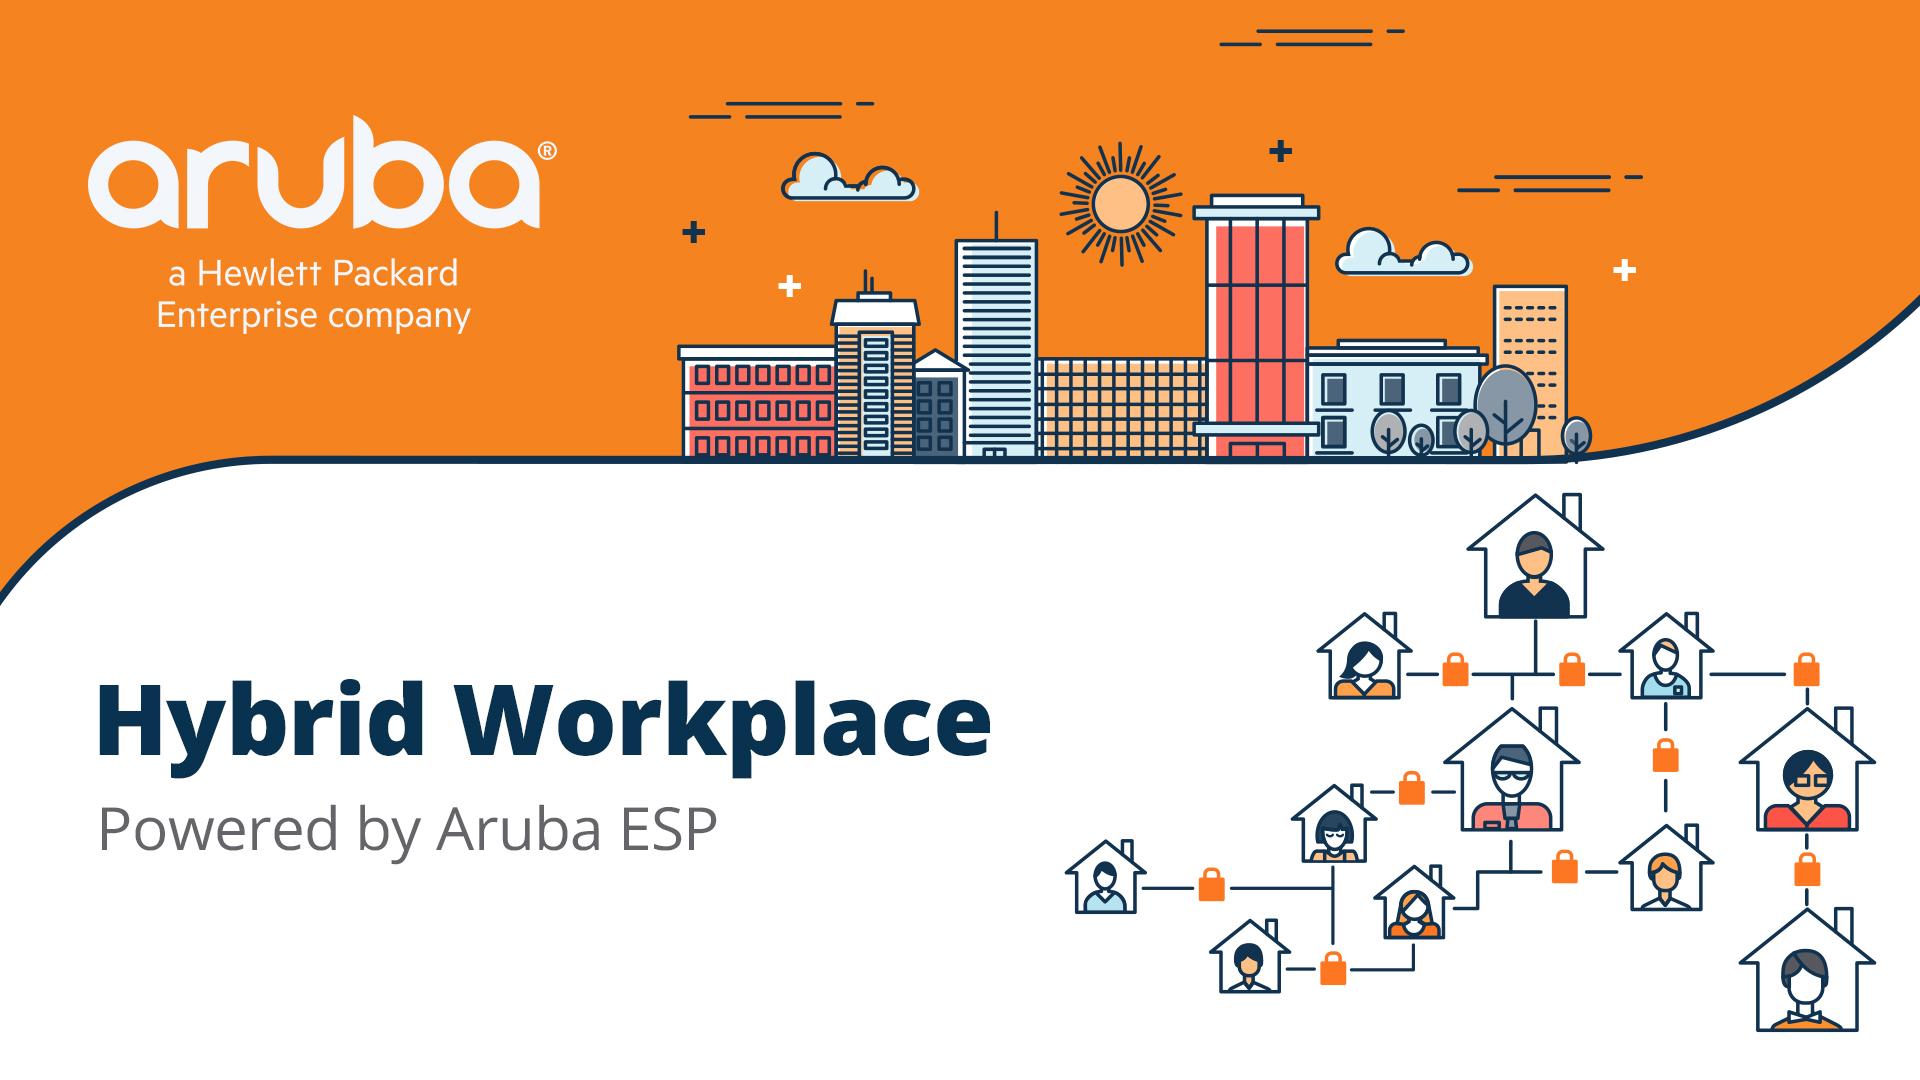 Aruba Hybrid Workplace